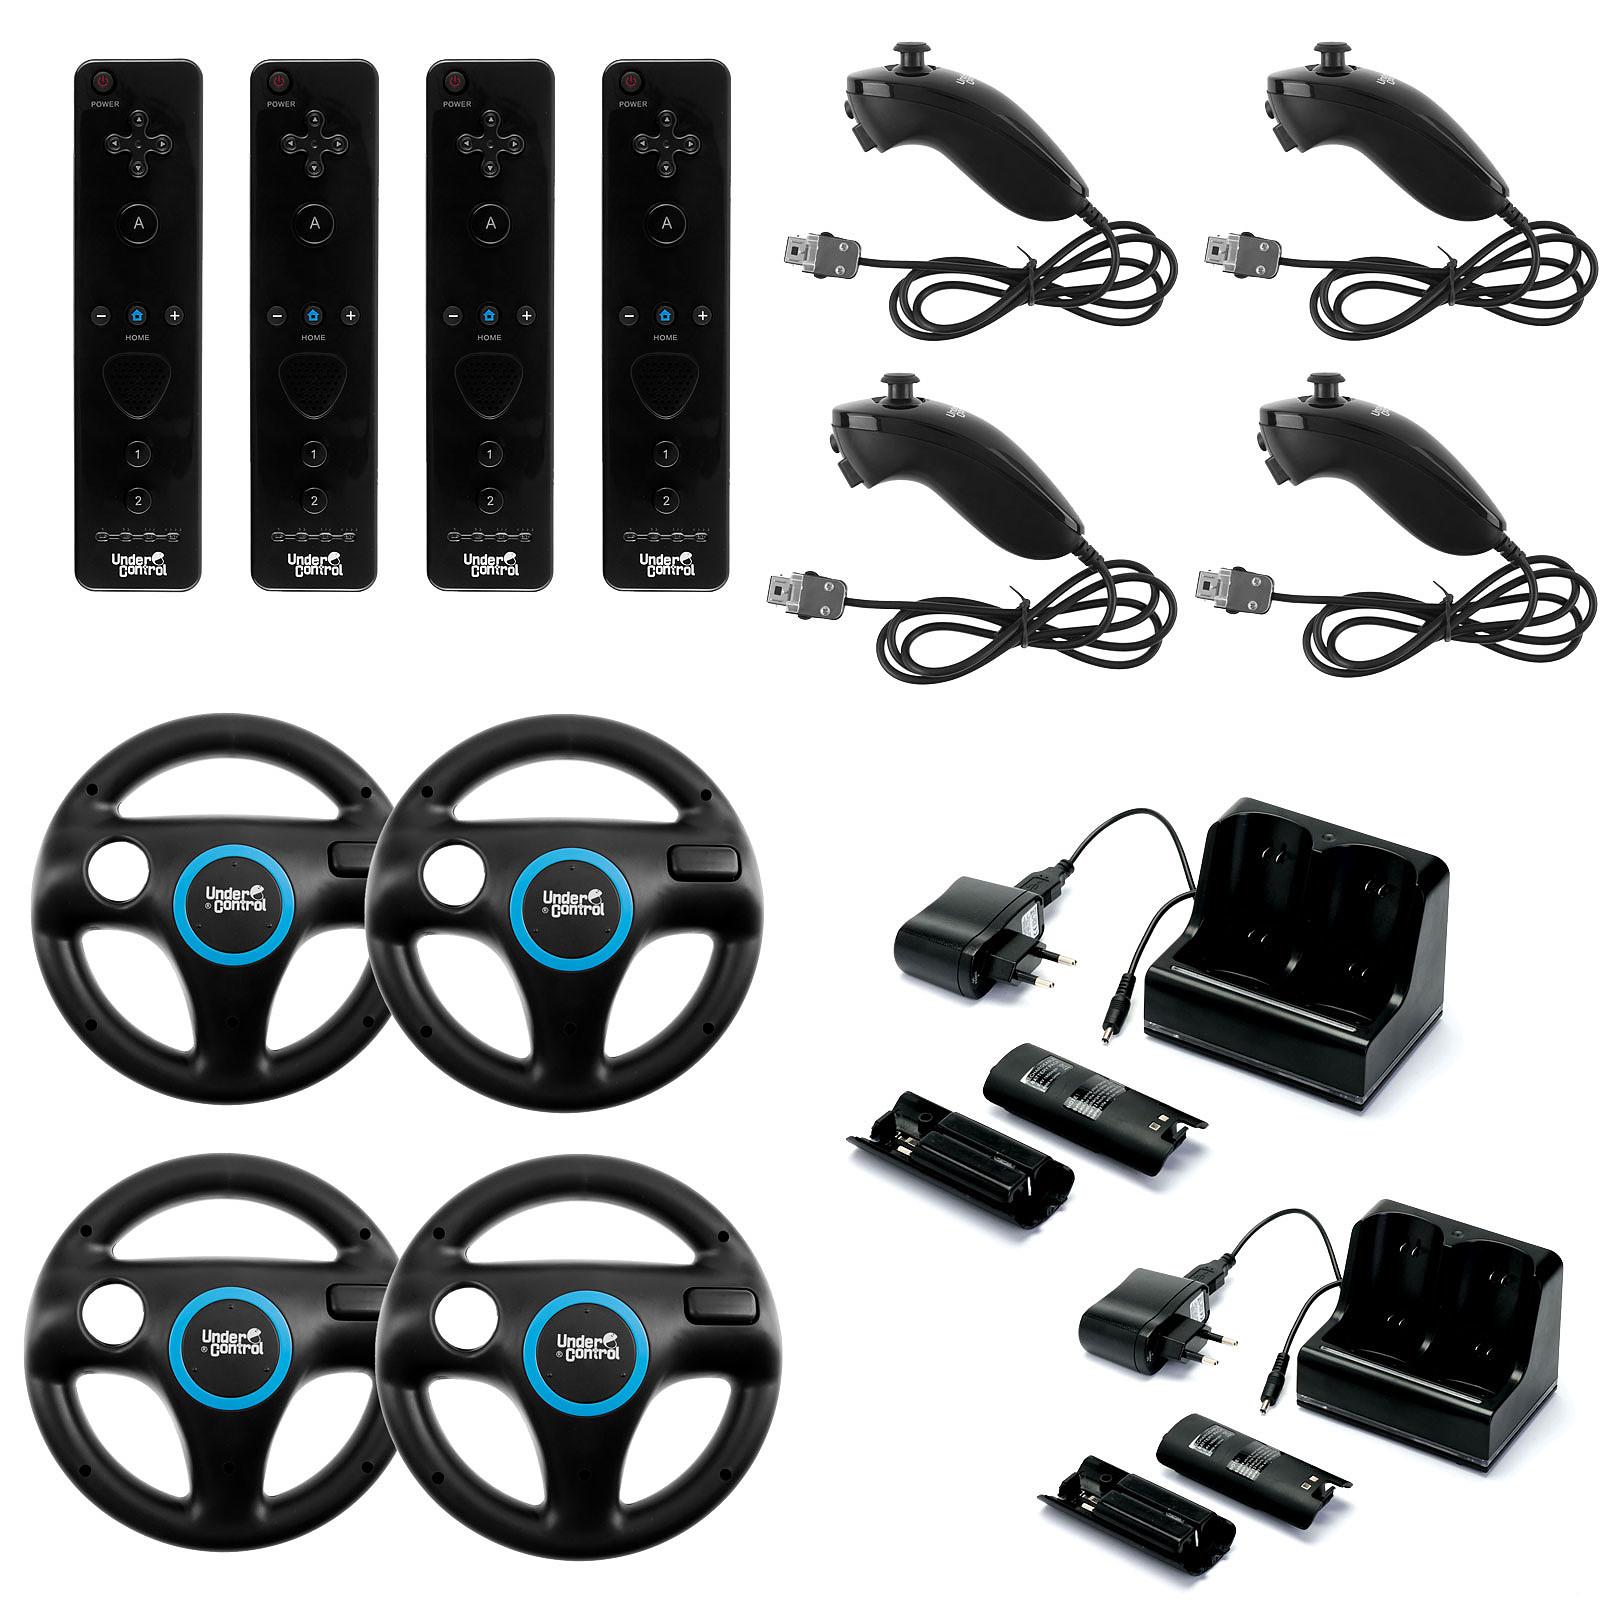 Under Control Wii/Wii U Family Kit (coloris noir)